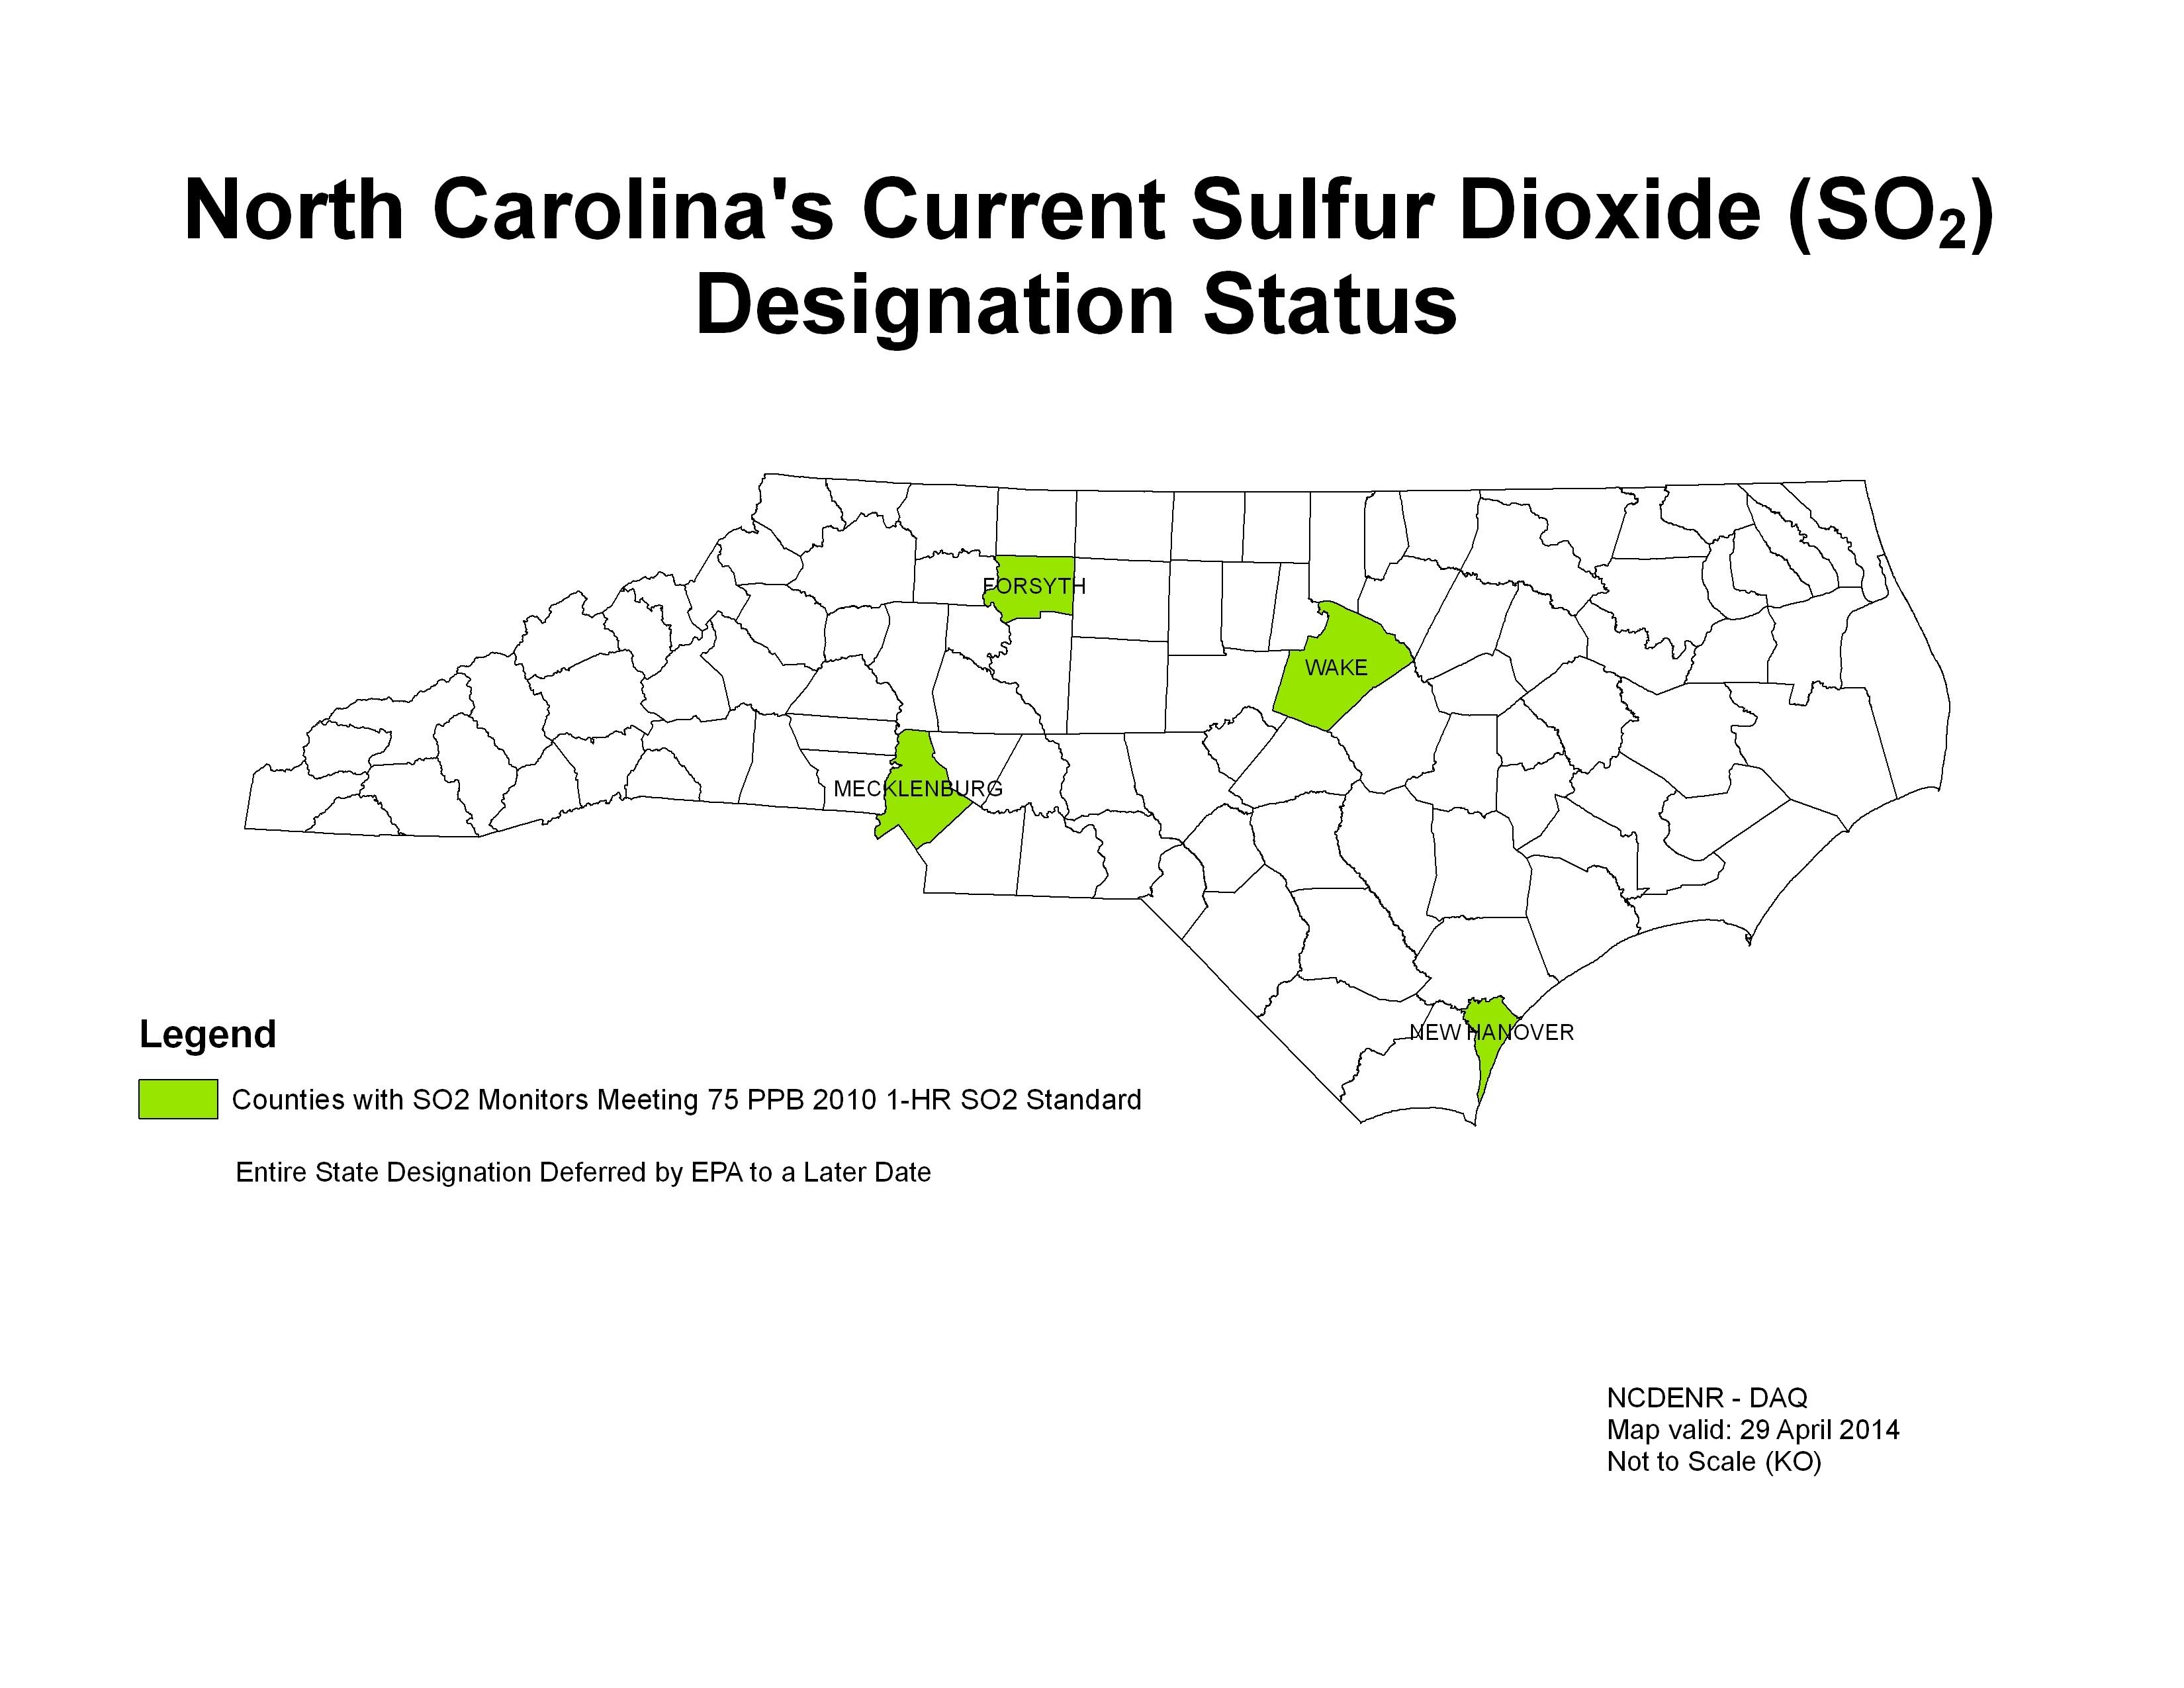 North Carolina's Current Sulfur Dioxide (SO2) Designation Status